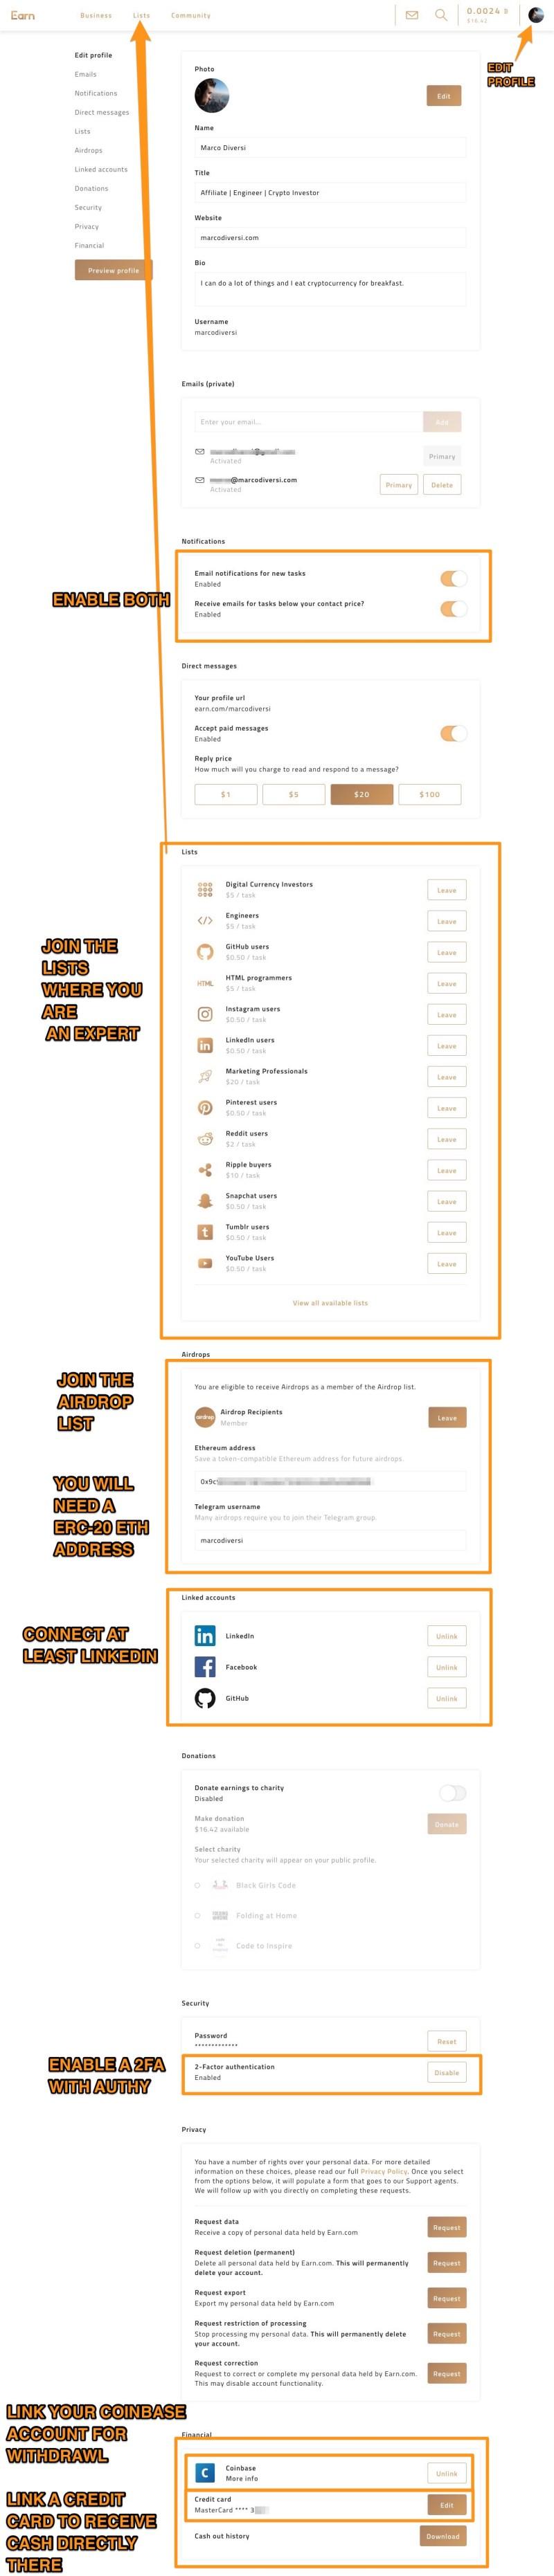 earn.com best settings